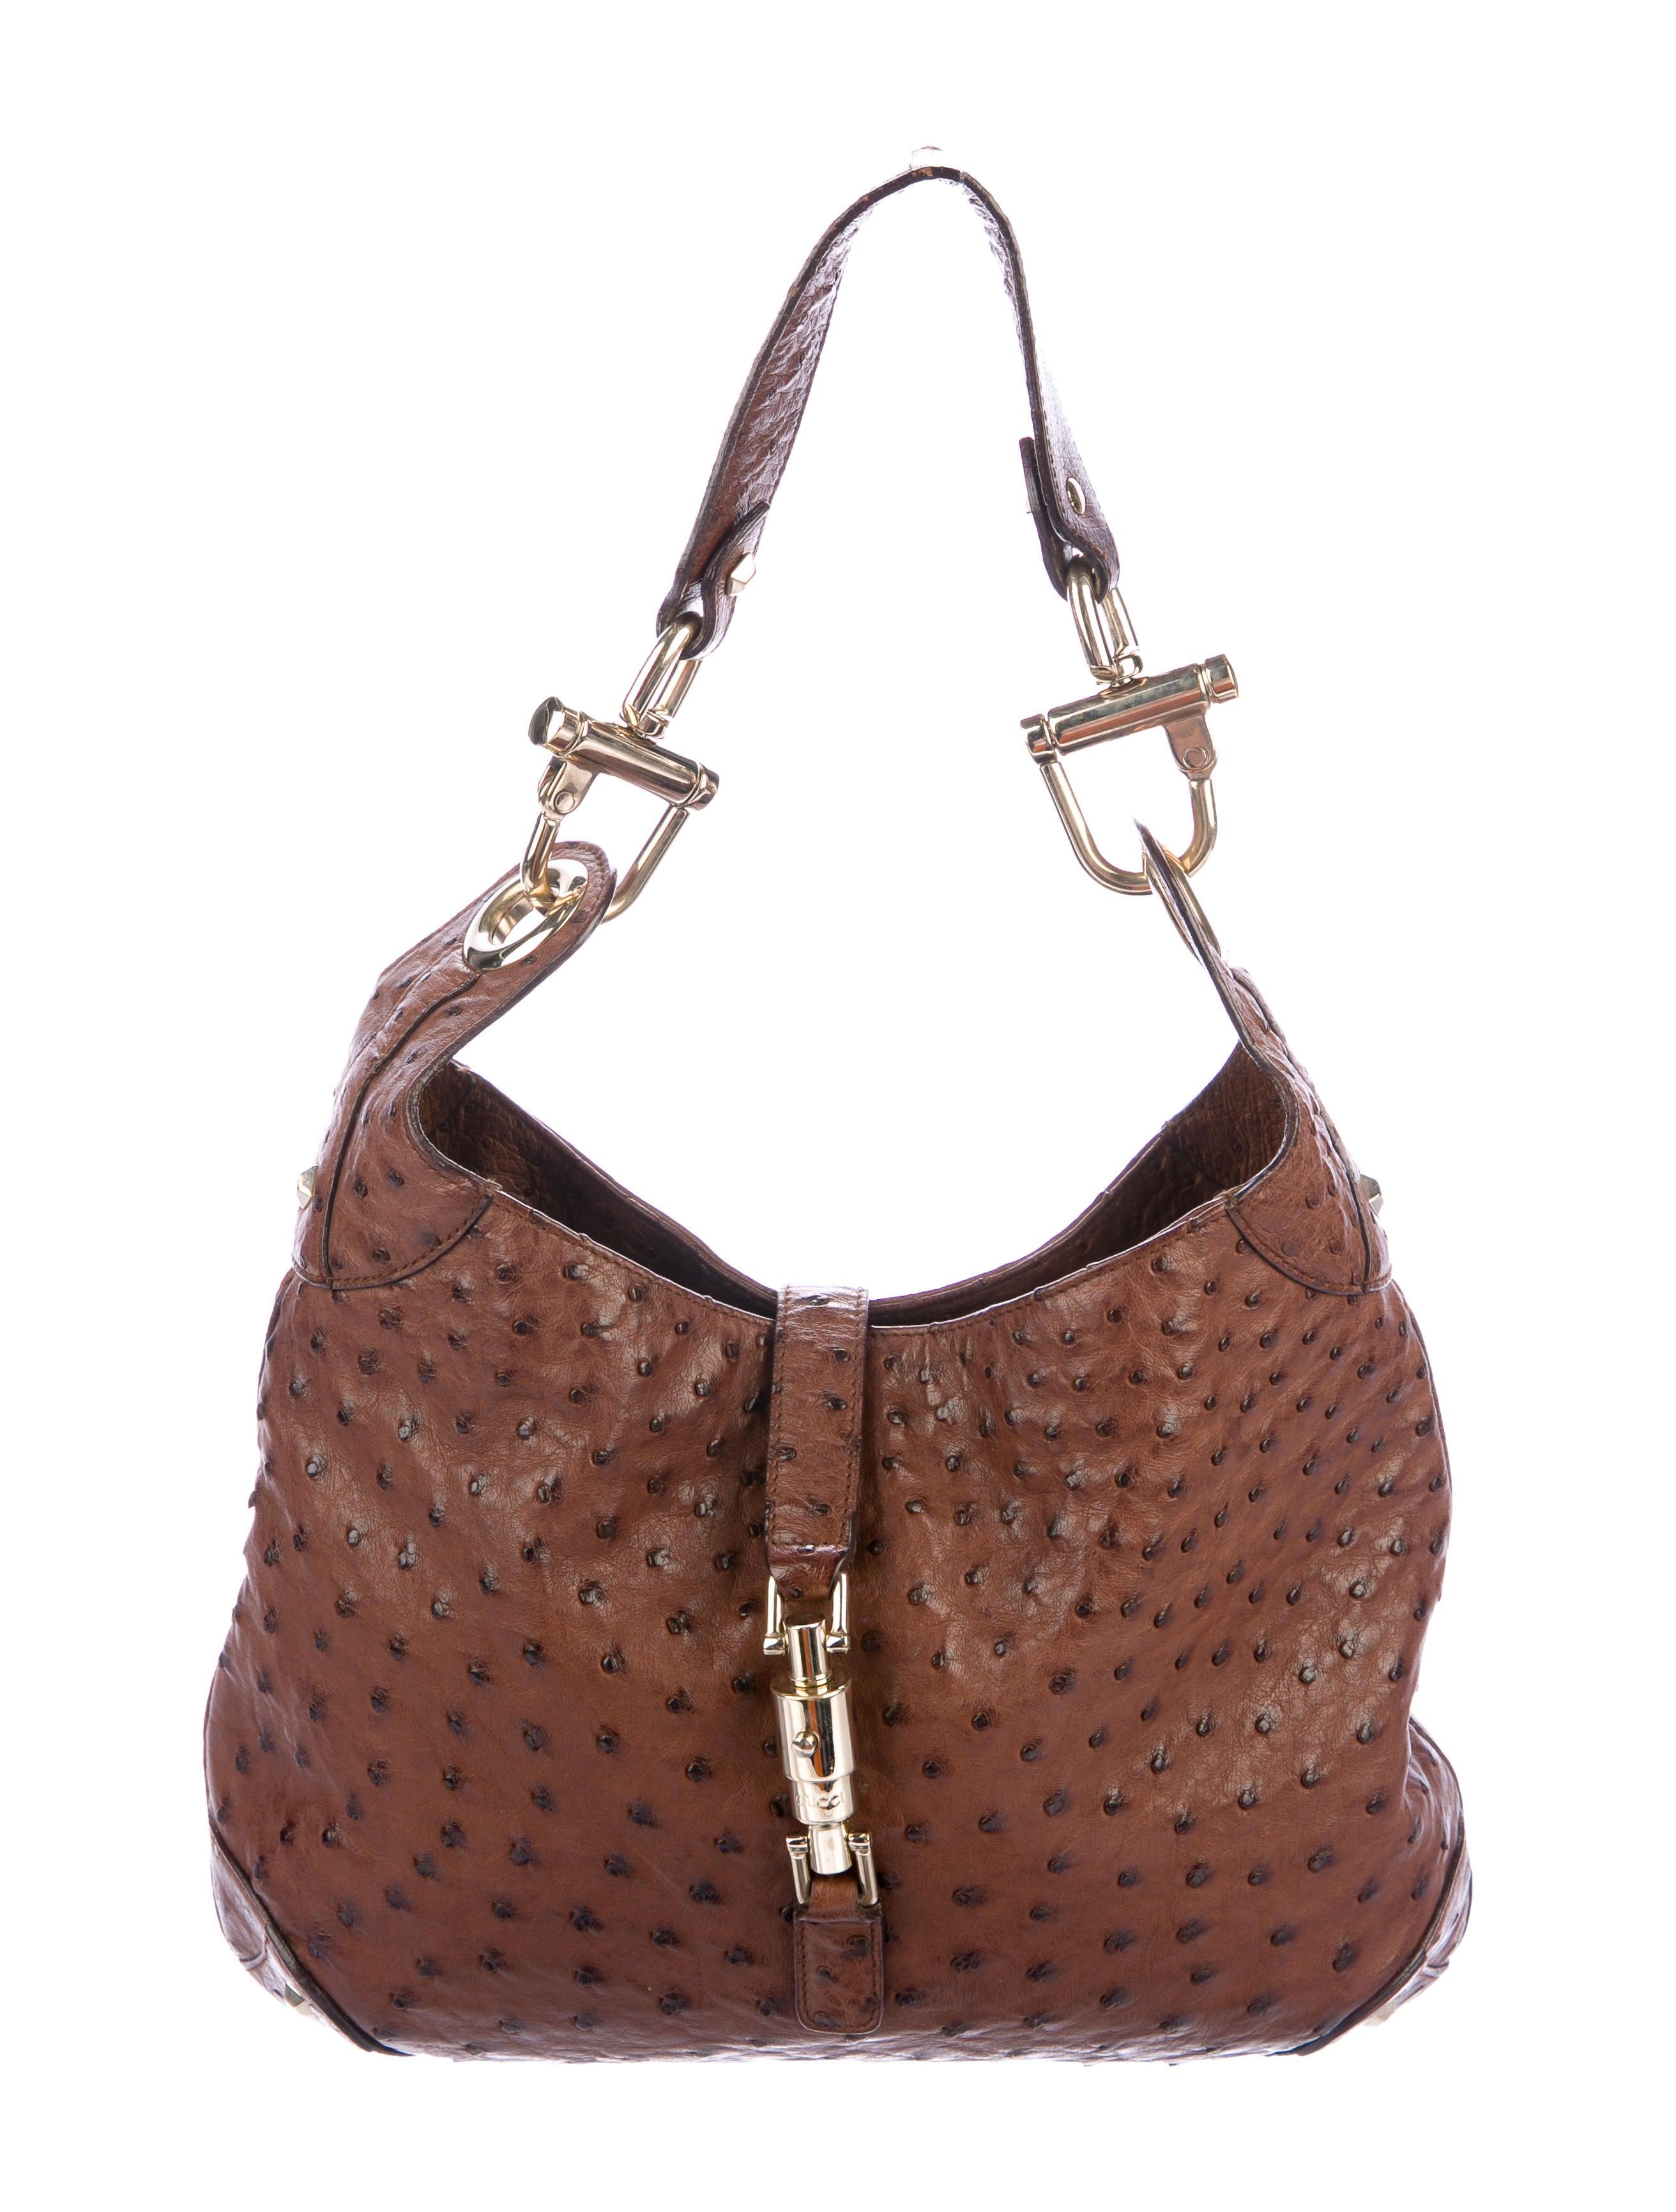 8e02a4b17 Gucci Ostrich Jackie Bag - Handbags - GUC222843   The RealReal